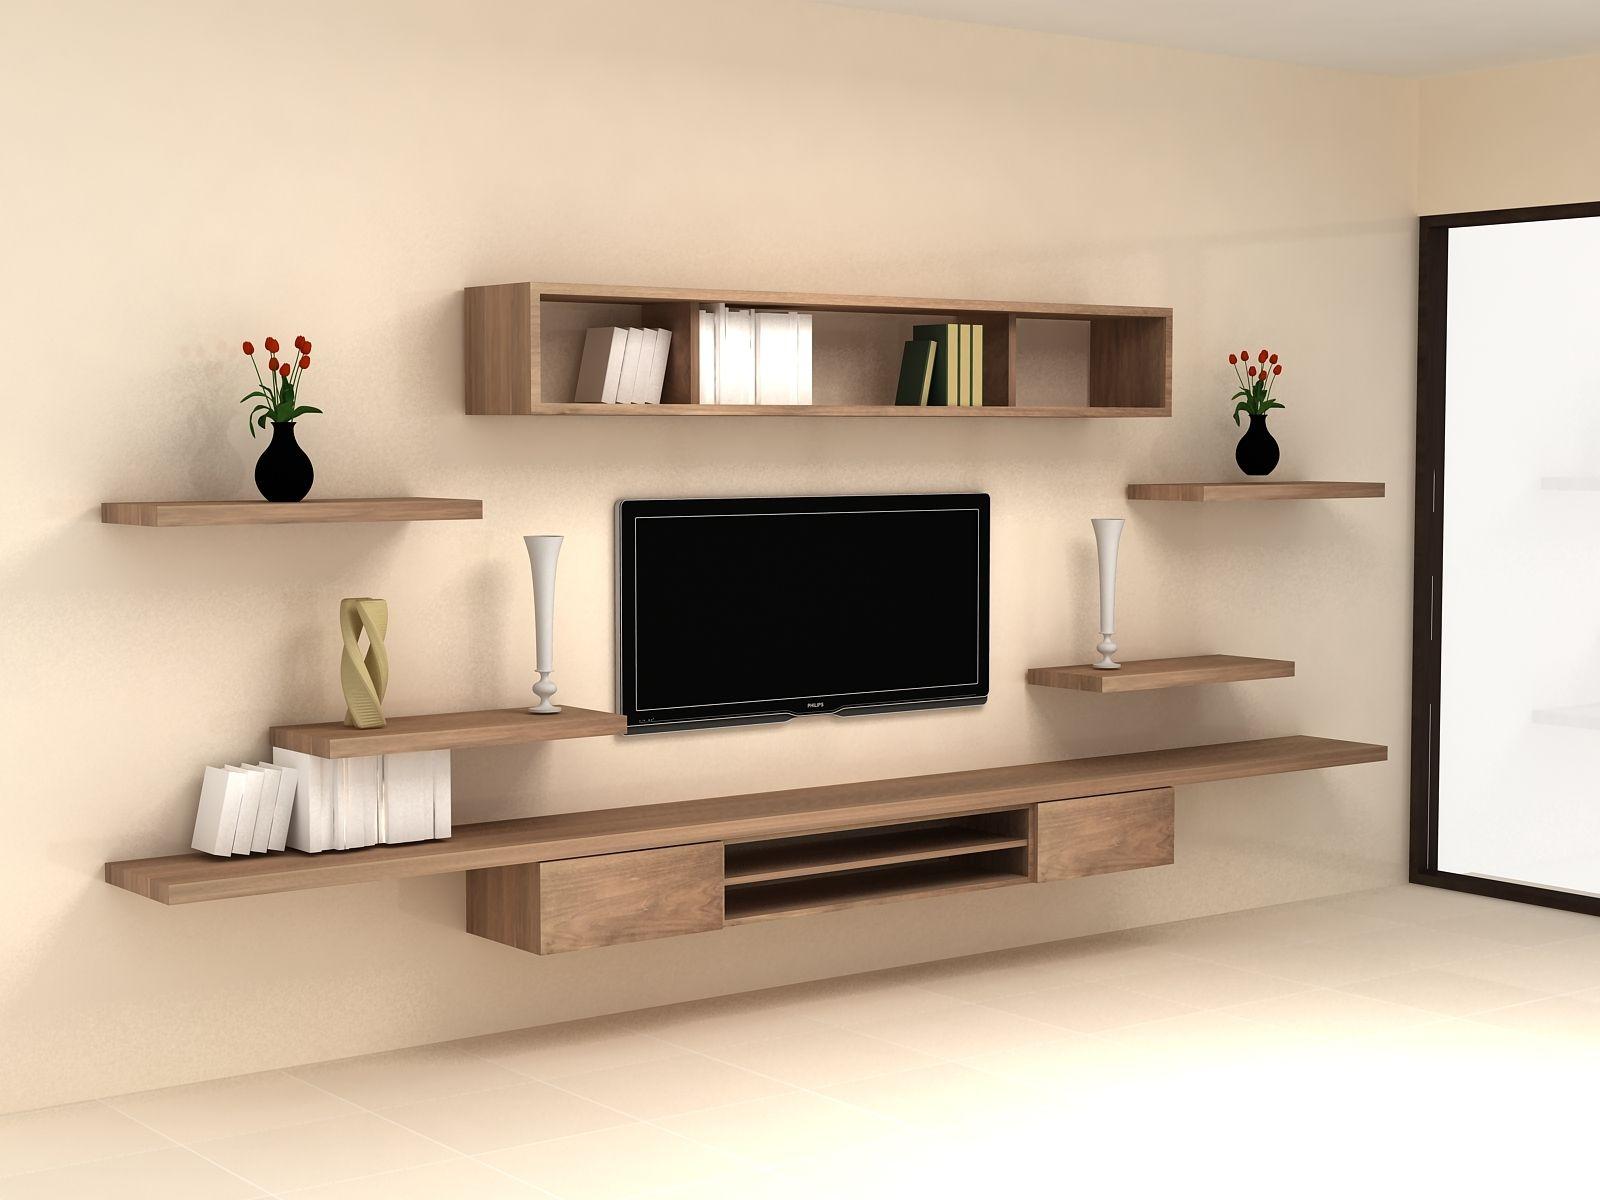 Wall Tv Cabinet Ideas Living Room Tv Wall Wall Mounted Tv